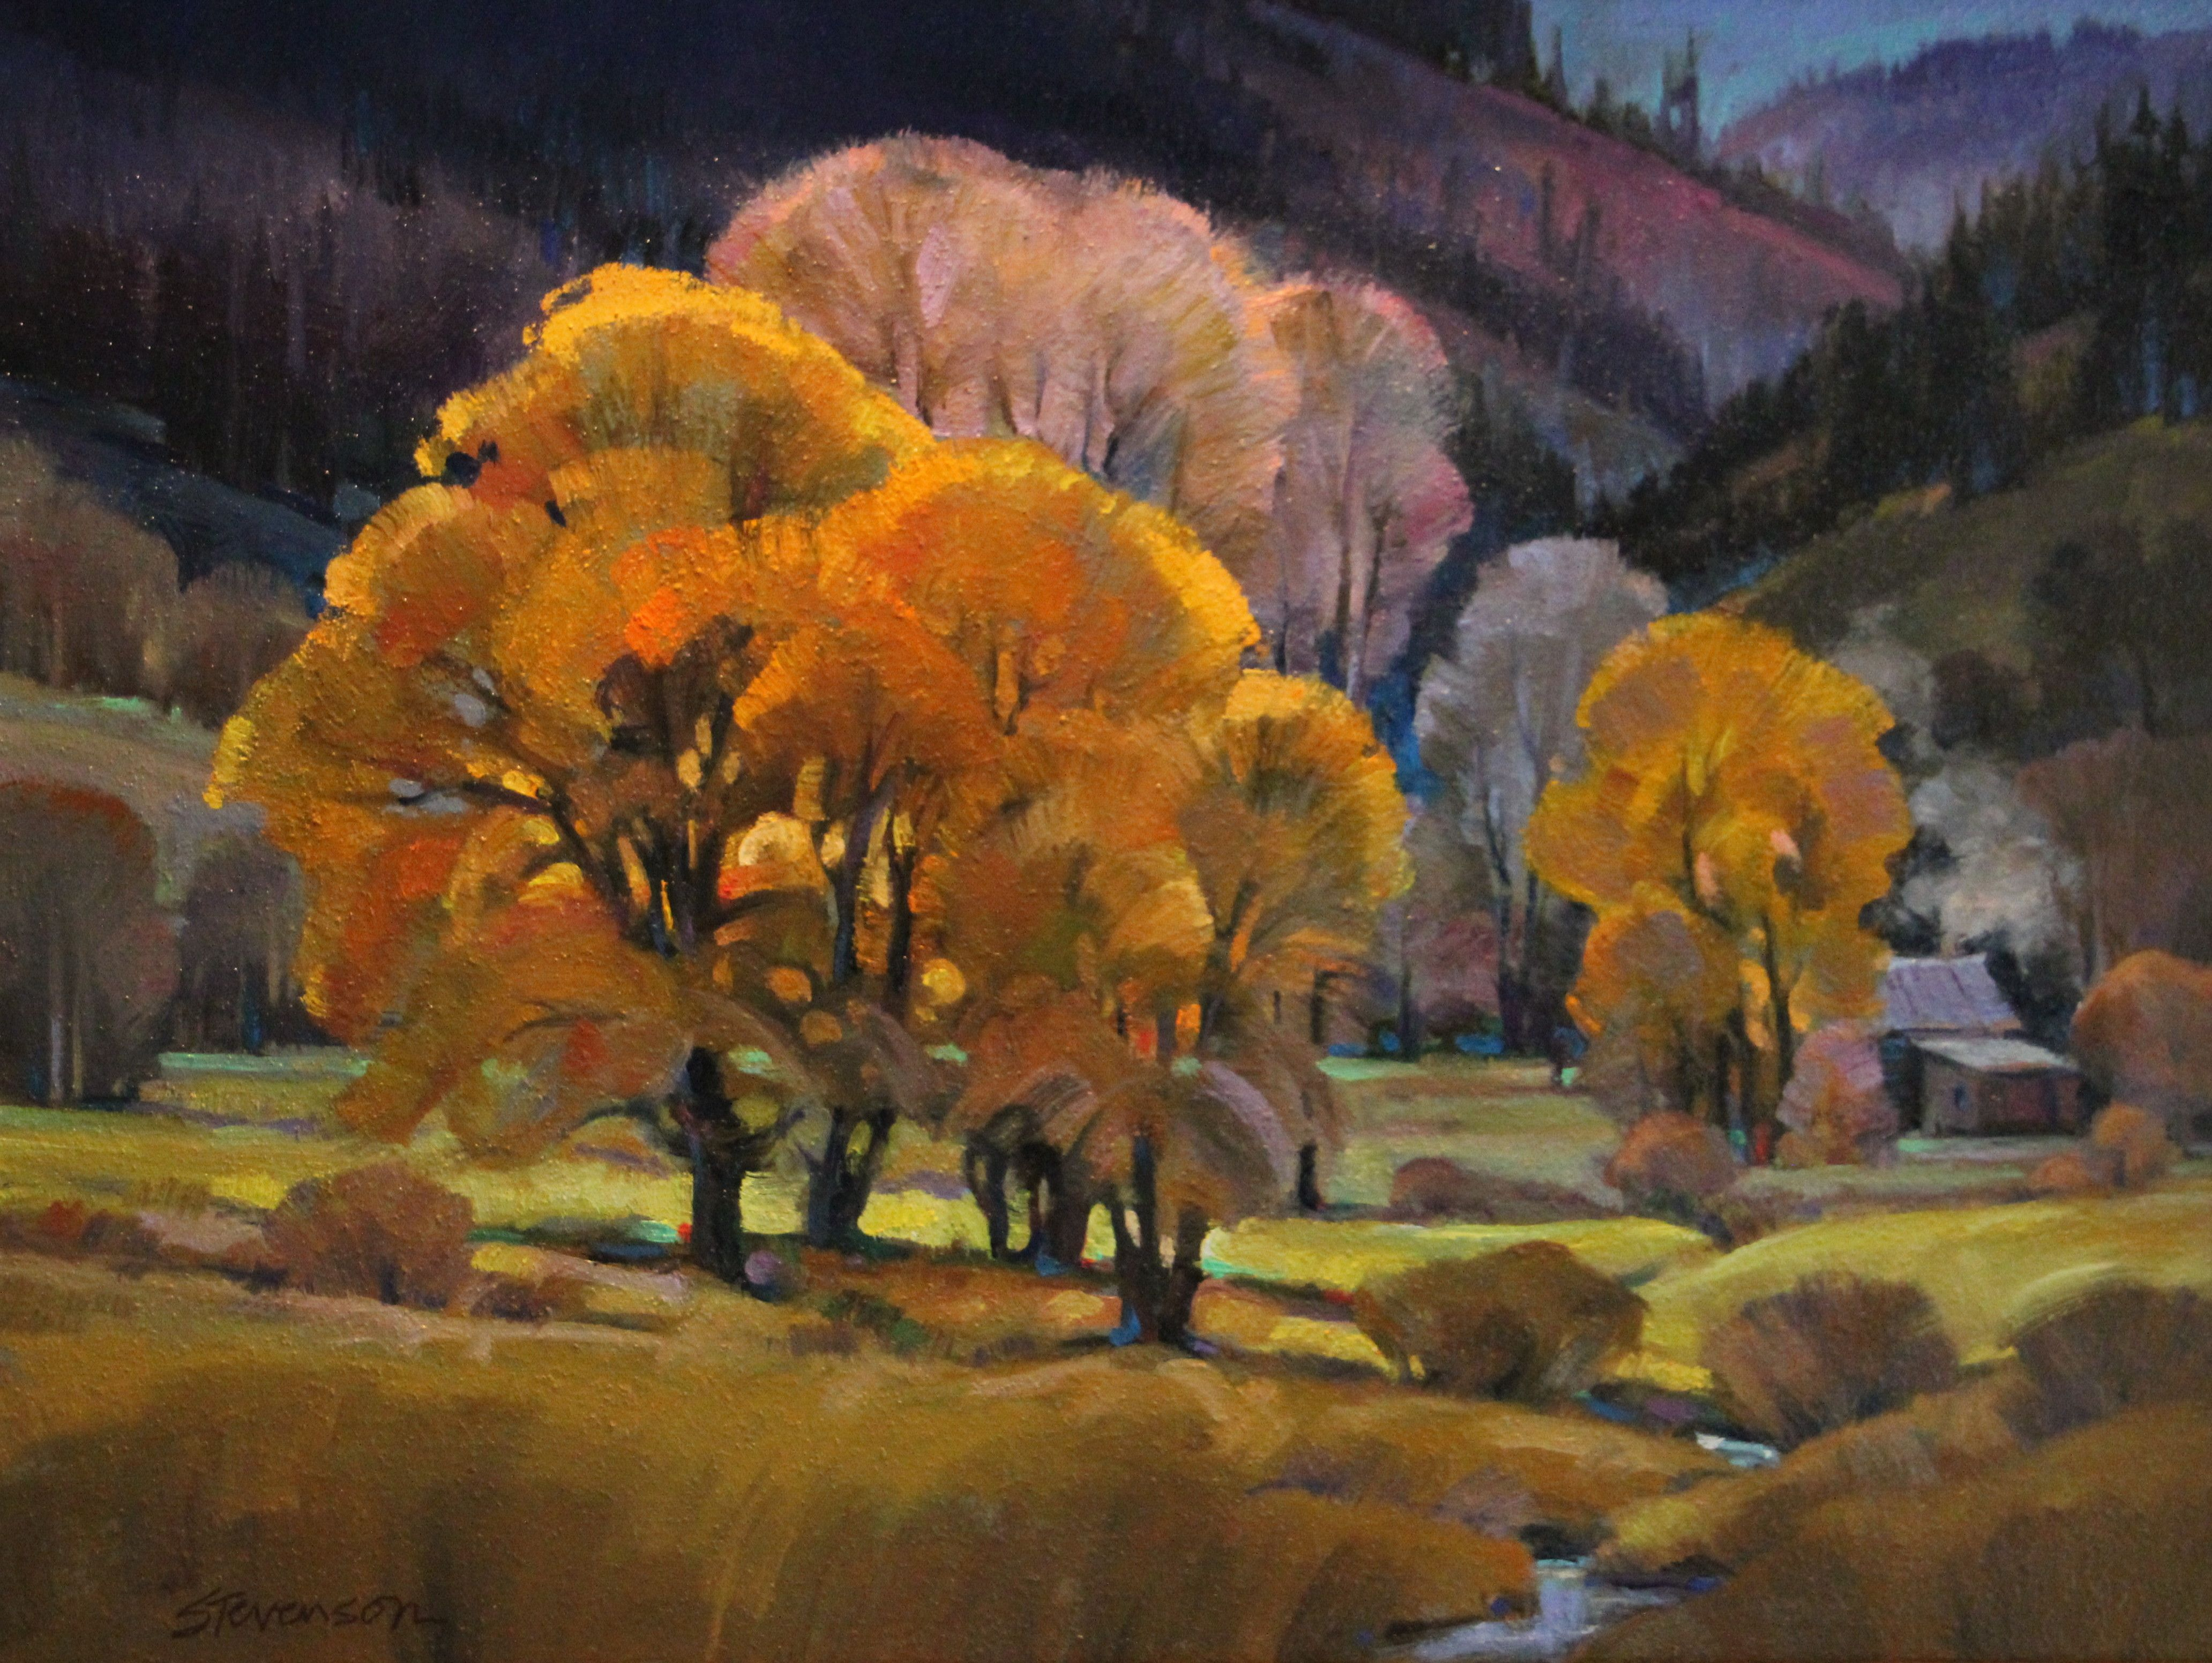 1917 California Headlands - George Bellows | Art, American ...  |1950s American Realism Art Landscapes